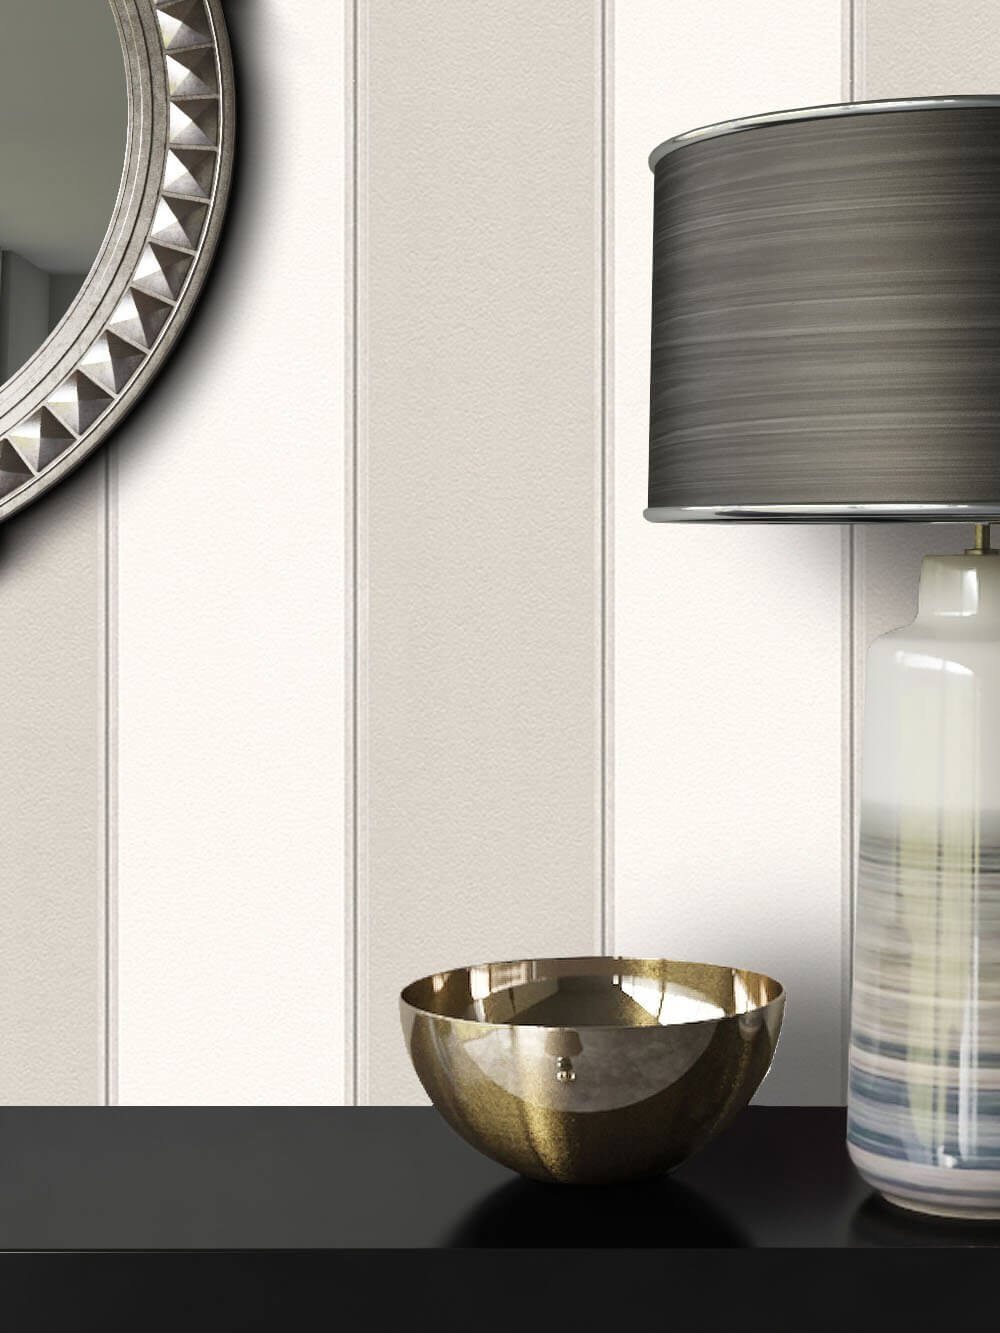 vliestapete beige grafik diele flur schlafen. Black Bedroom Furniture Sets. Home Design Ideas